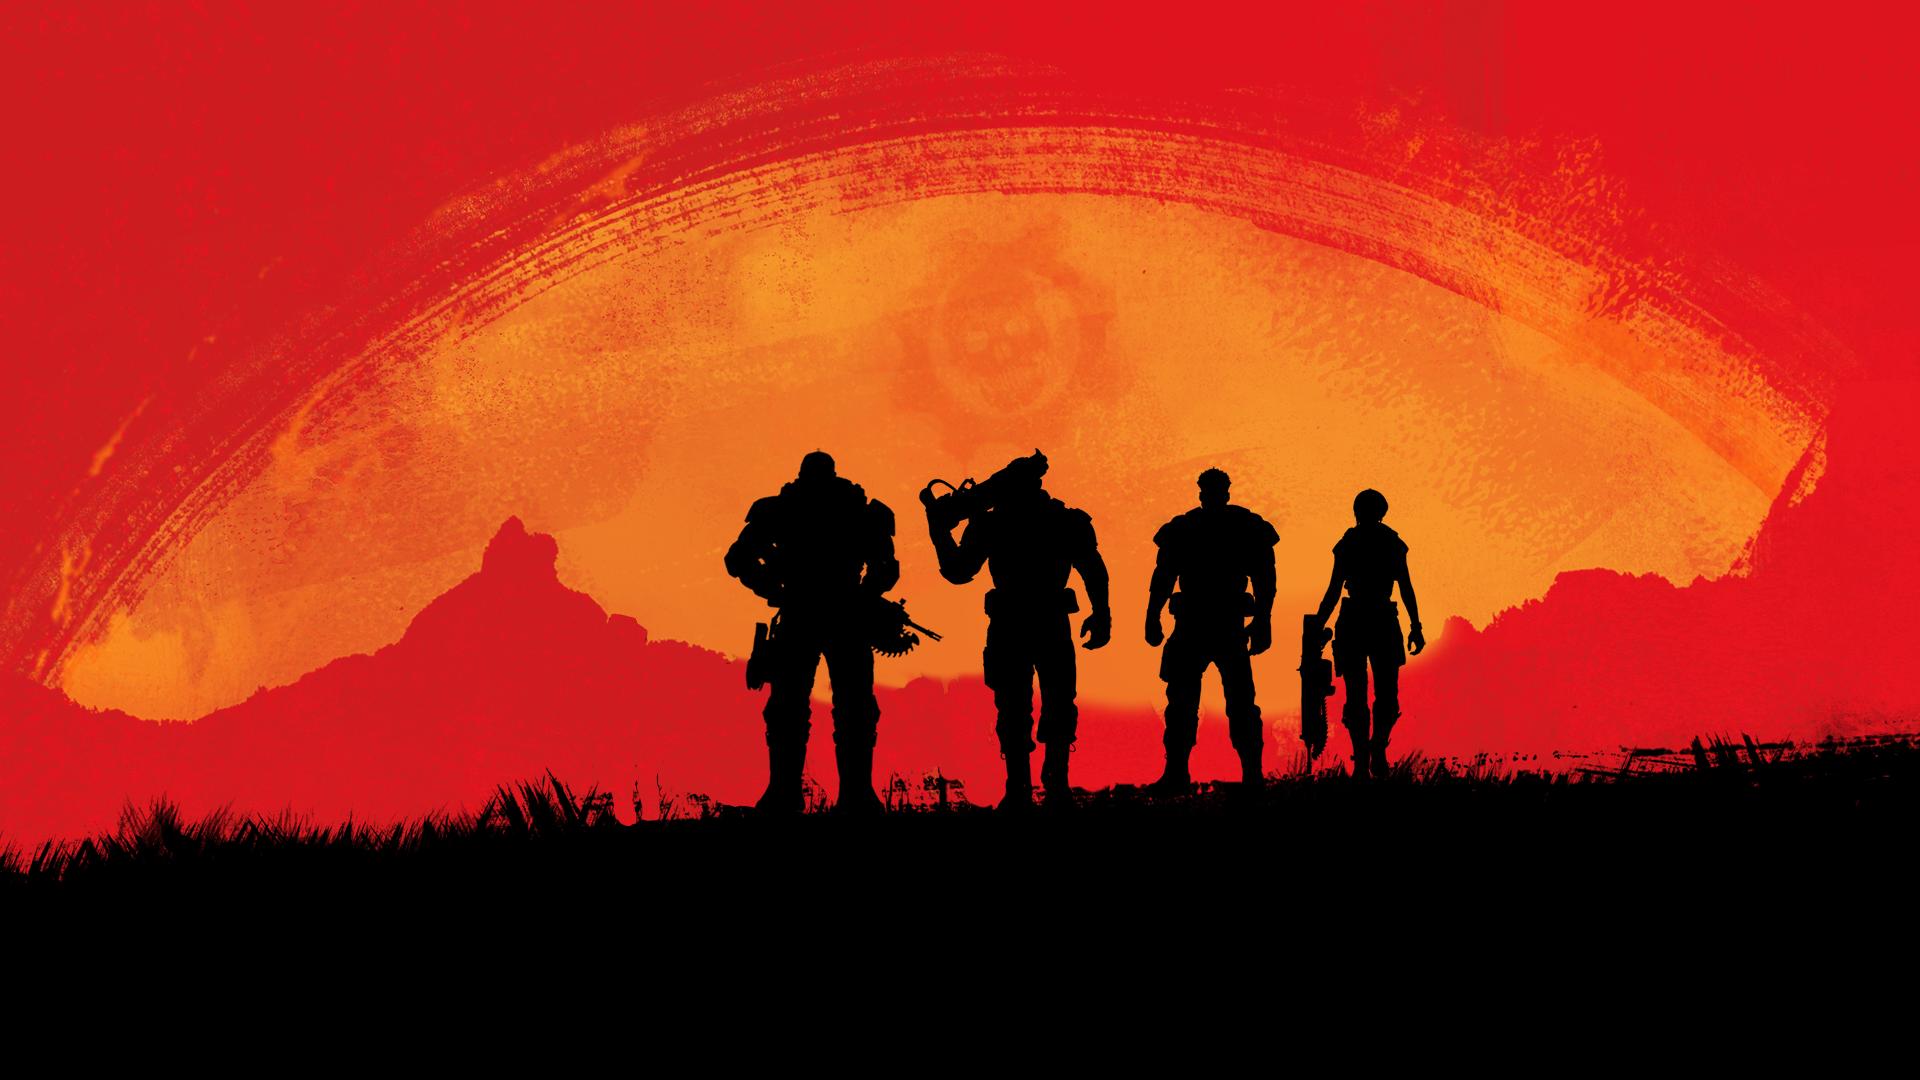 Free download Red Dead Redemption 2 Rockstar Wallpaper ...